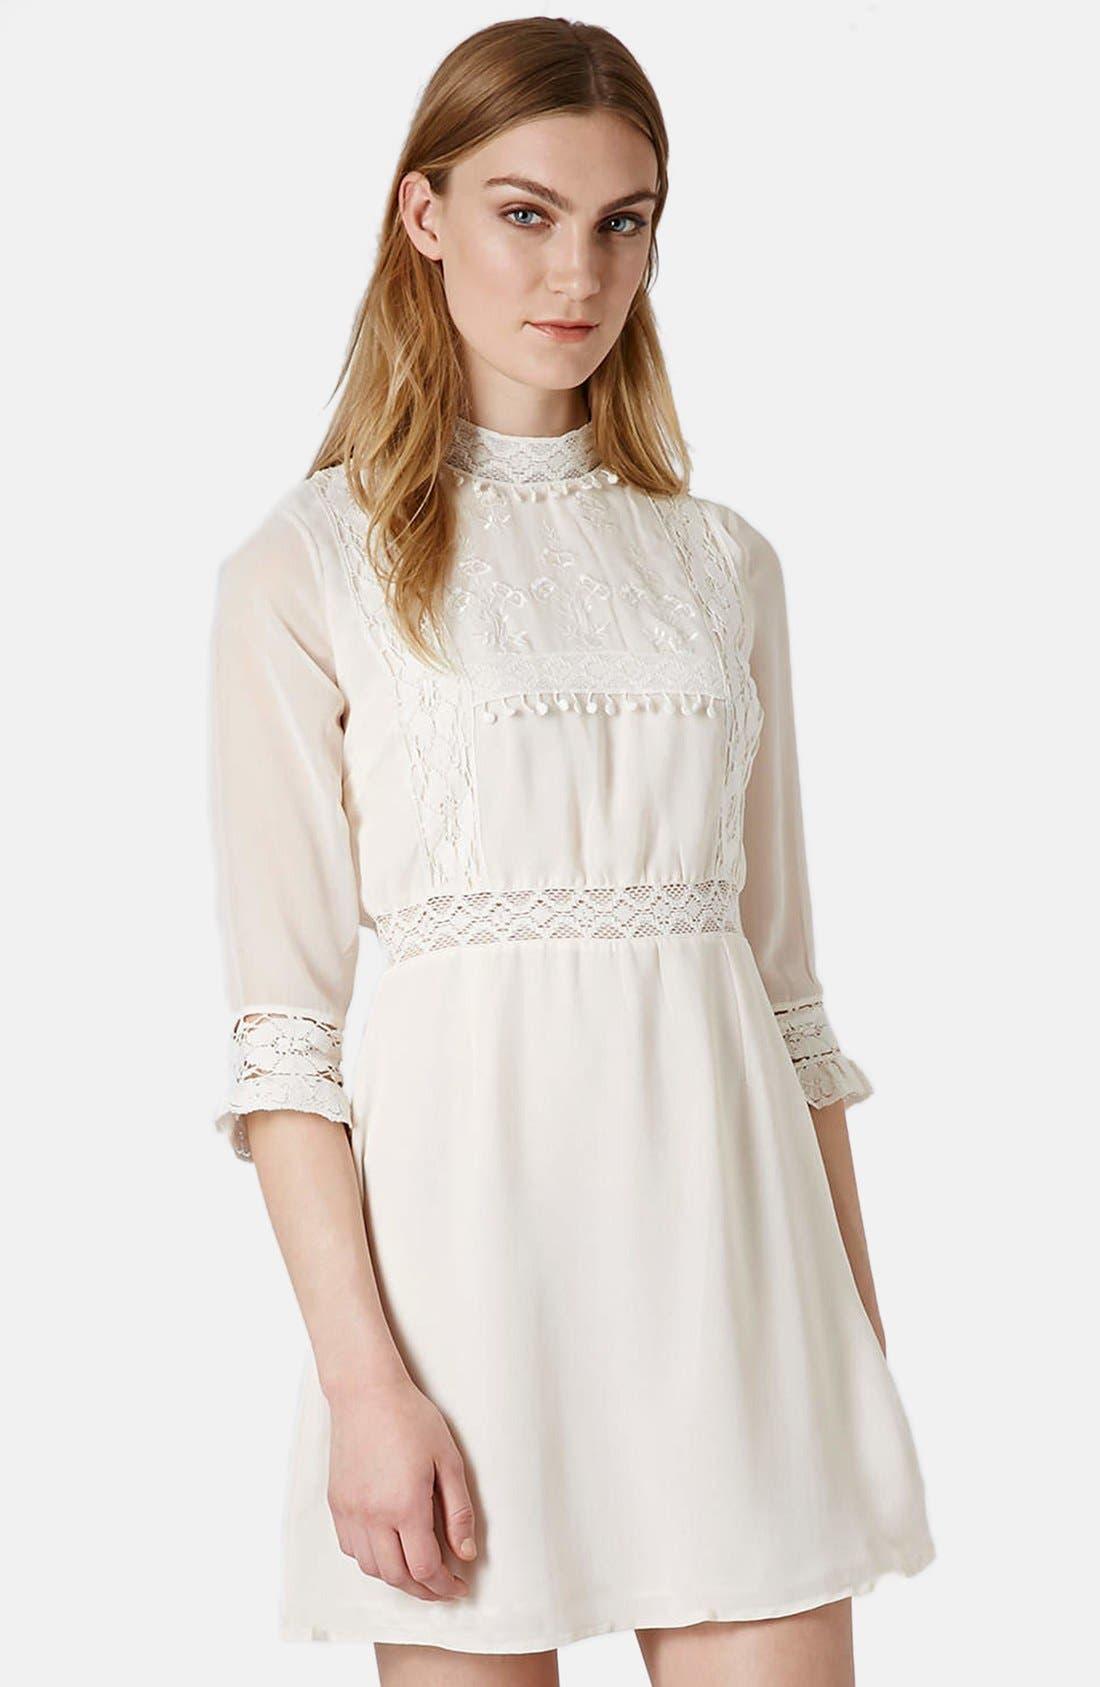 Alternate Image 1 Selected - Topshop 'Victorina' Lace Detail Dress